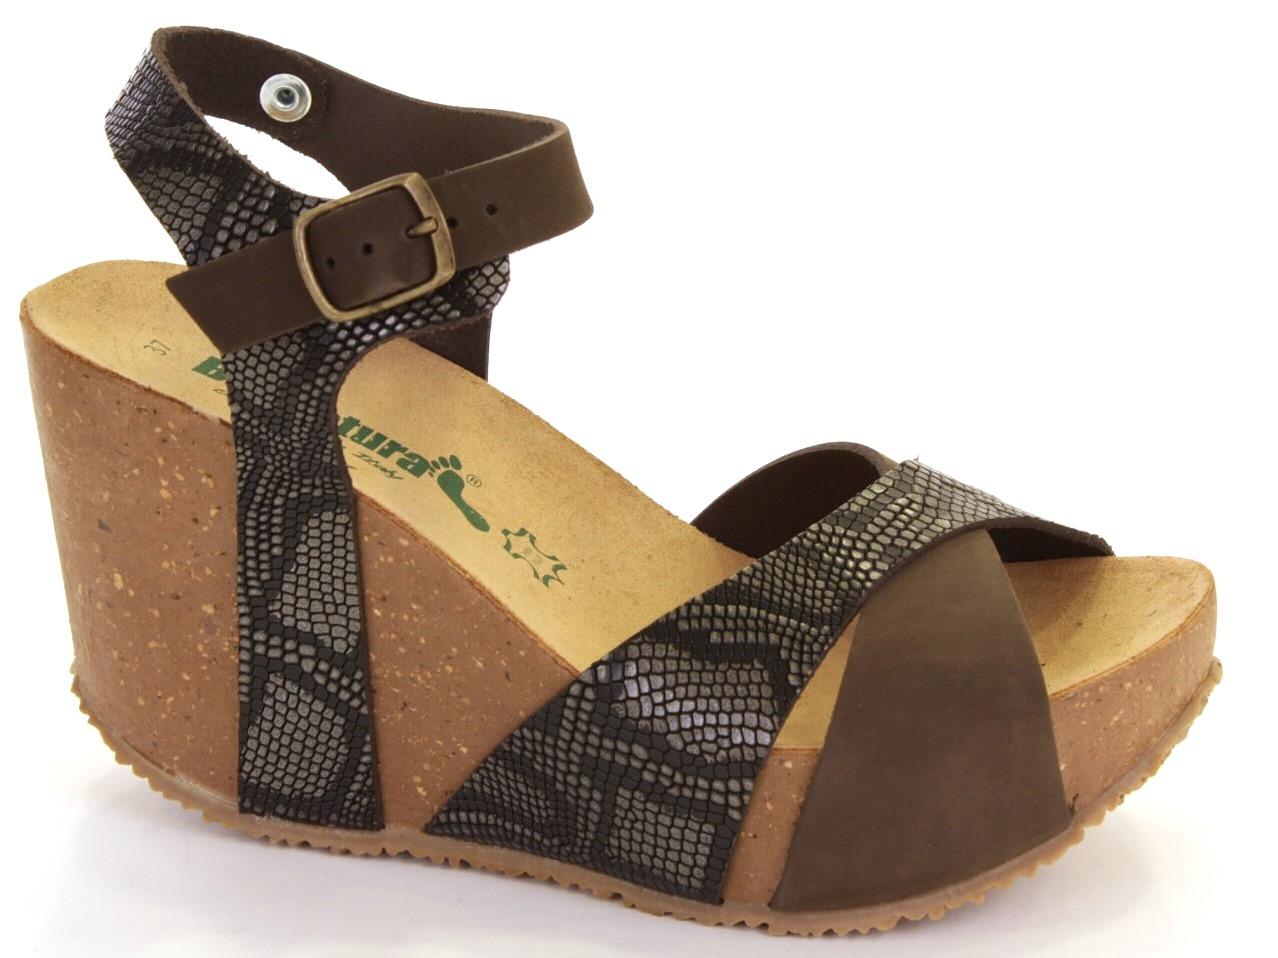 Wedge Sandals Bionatura - 328 29 A 897